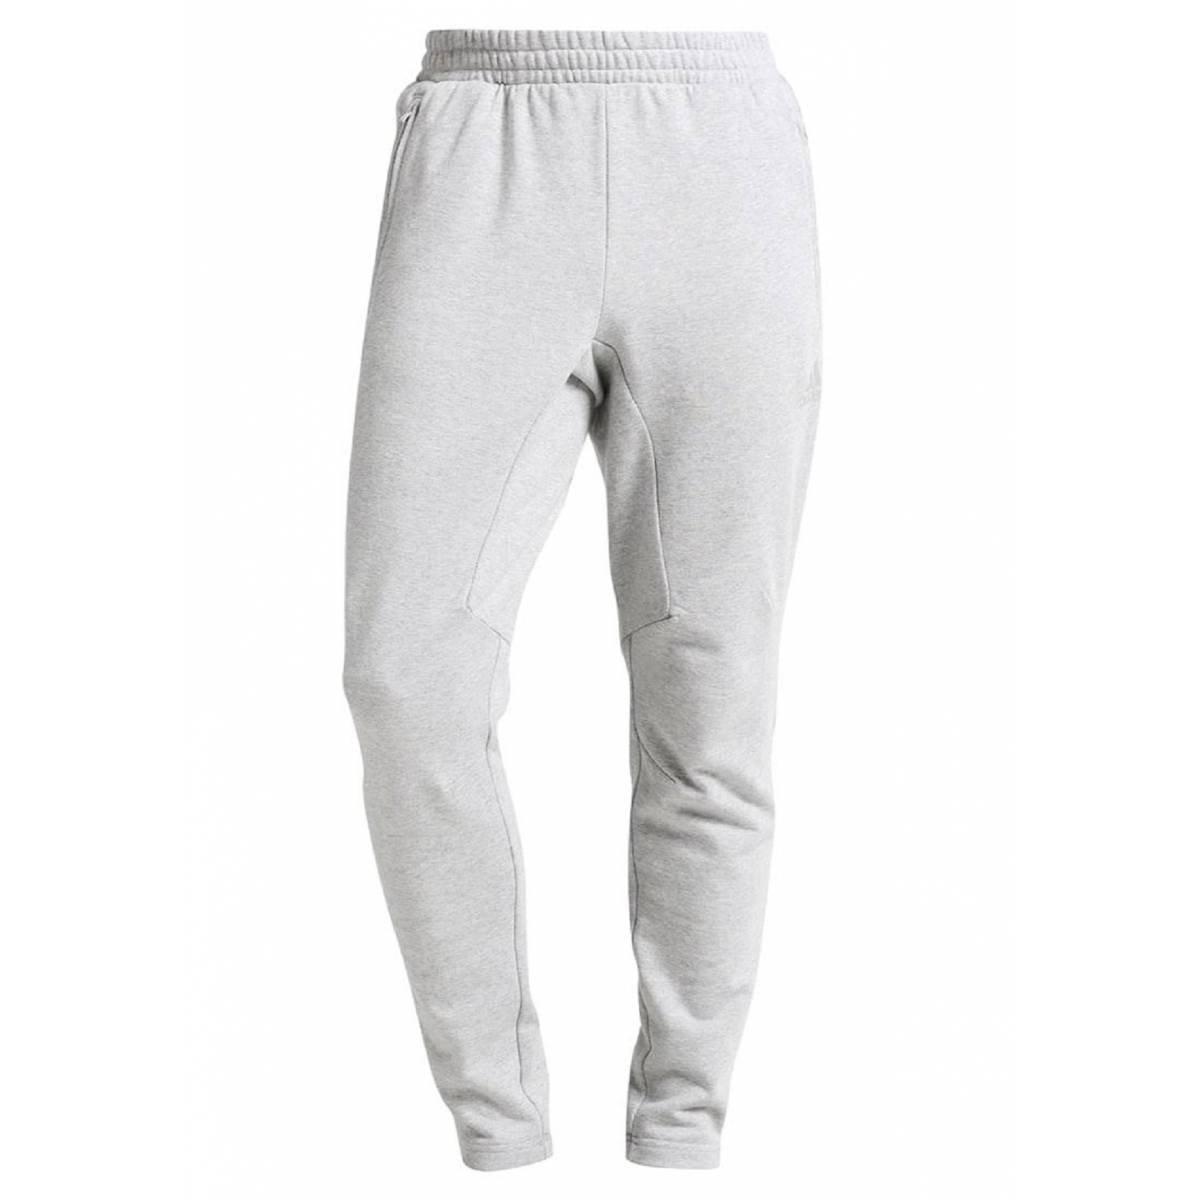 Adidas Herren Tango Future Jogginghose Hose